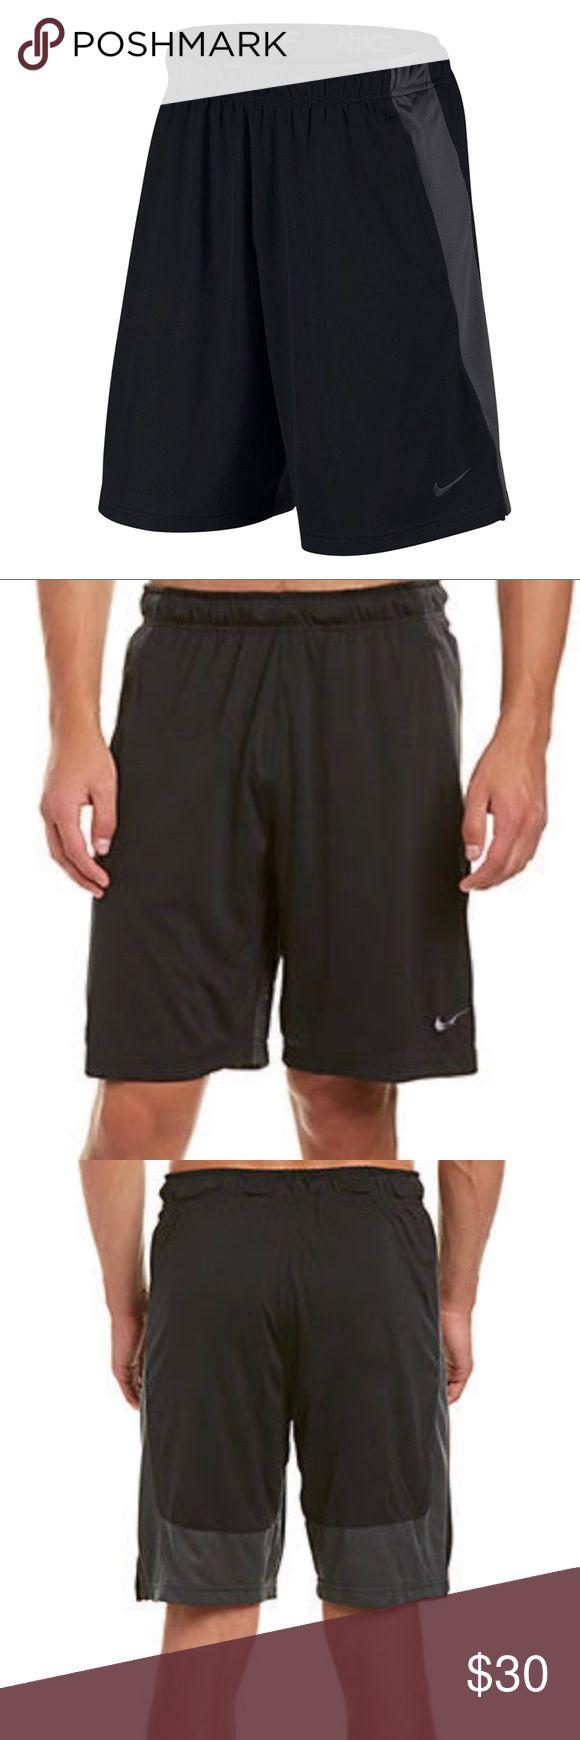 Nike Dri-FIT Workout Herrenshorts Größe Large Neu bei den Tags mit dem …   – My Posh Picks